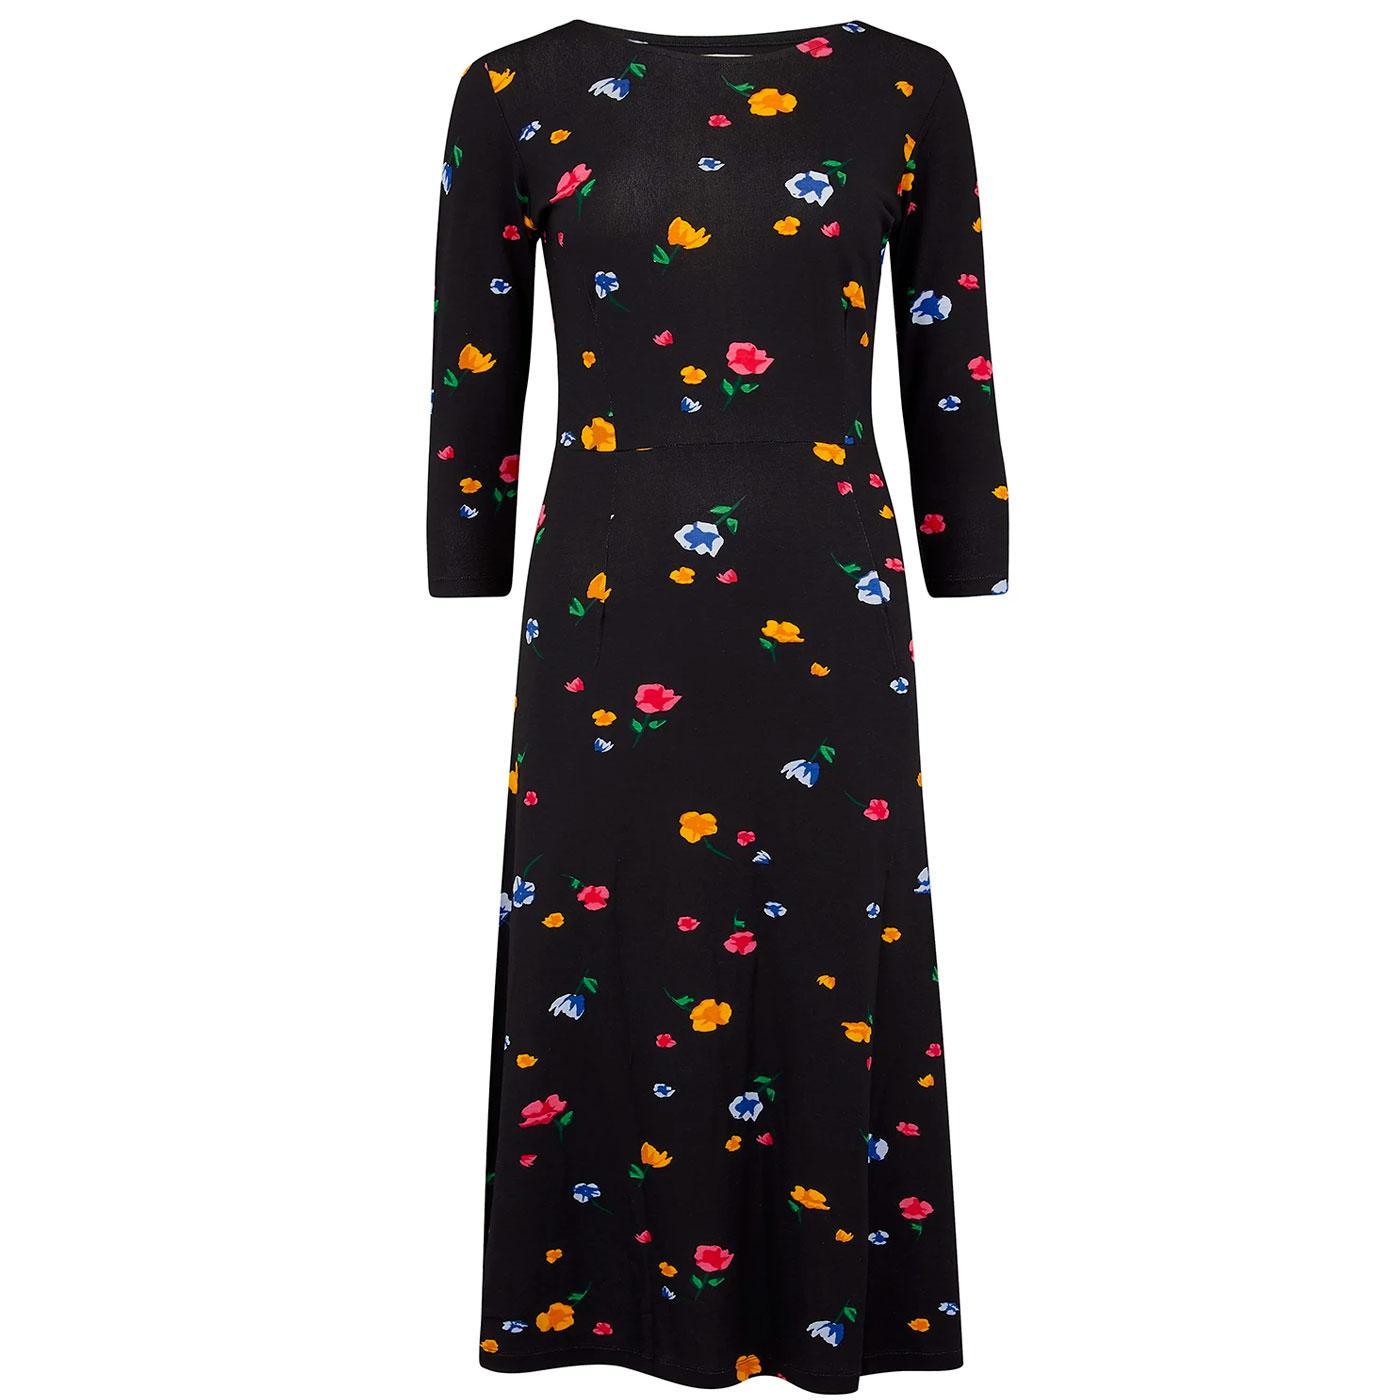 Nixie SUGARHILL BRIGHTON Painterly Floral Dress